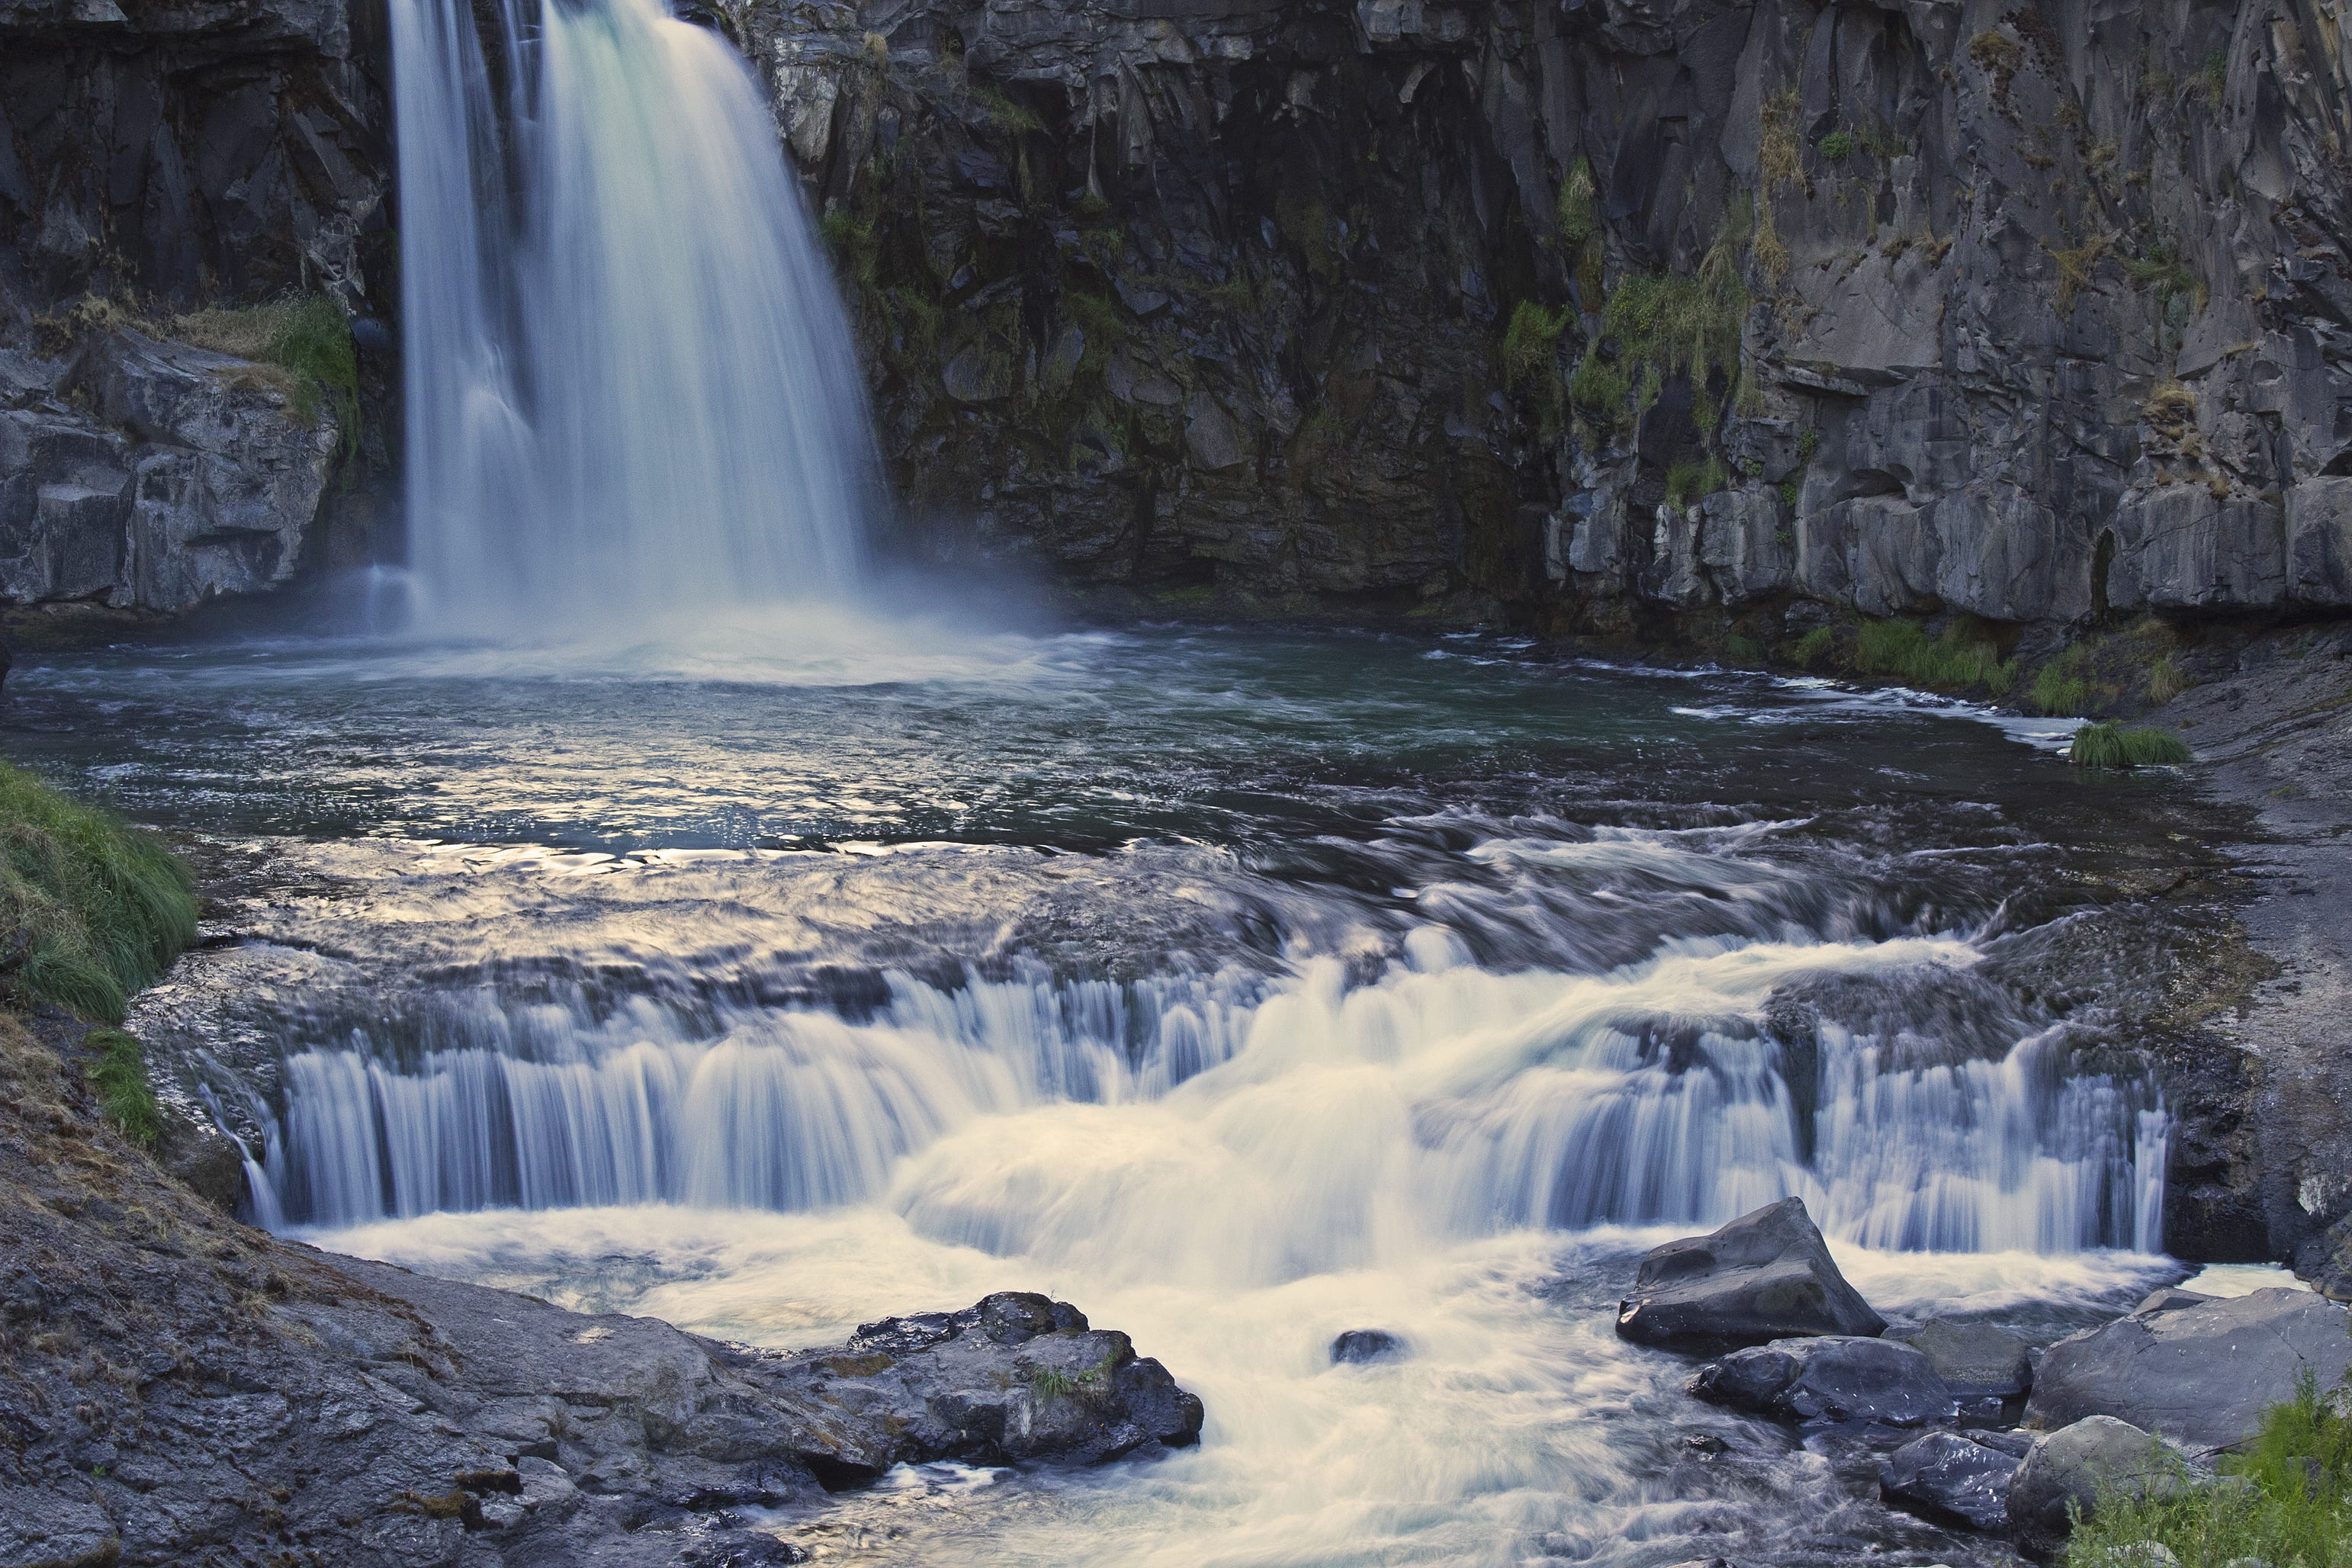 how to find some stillness